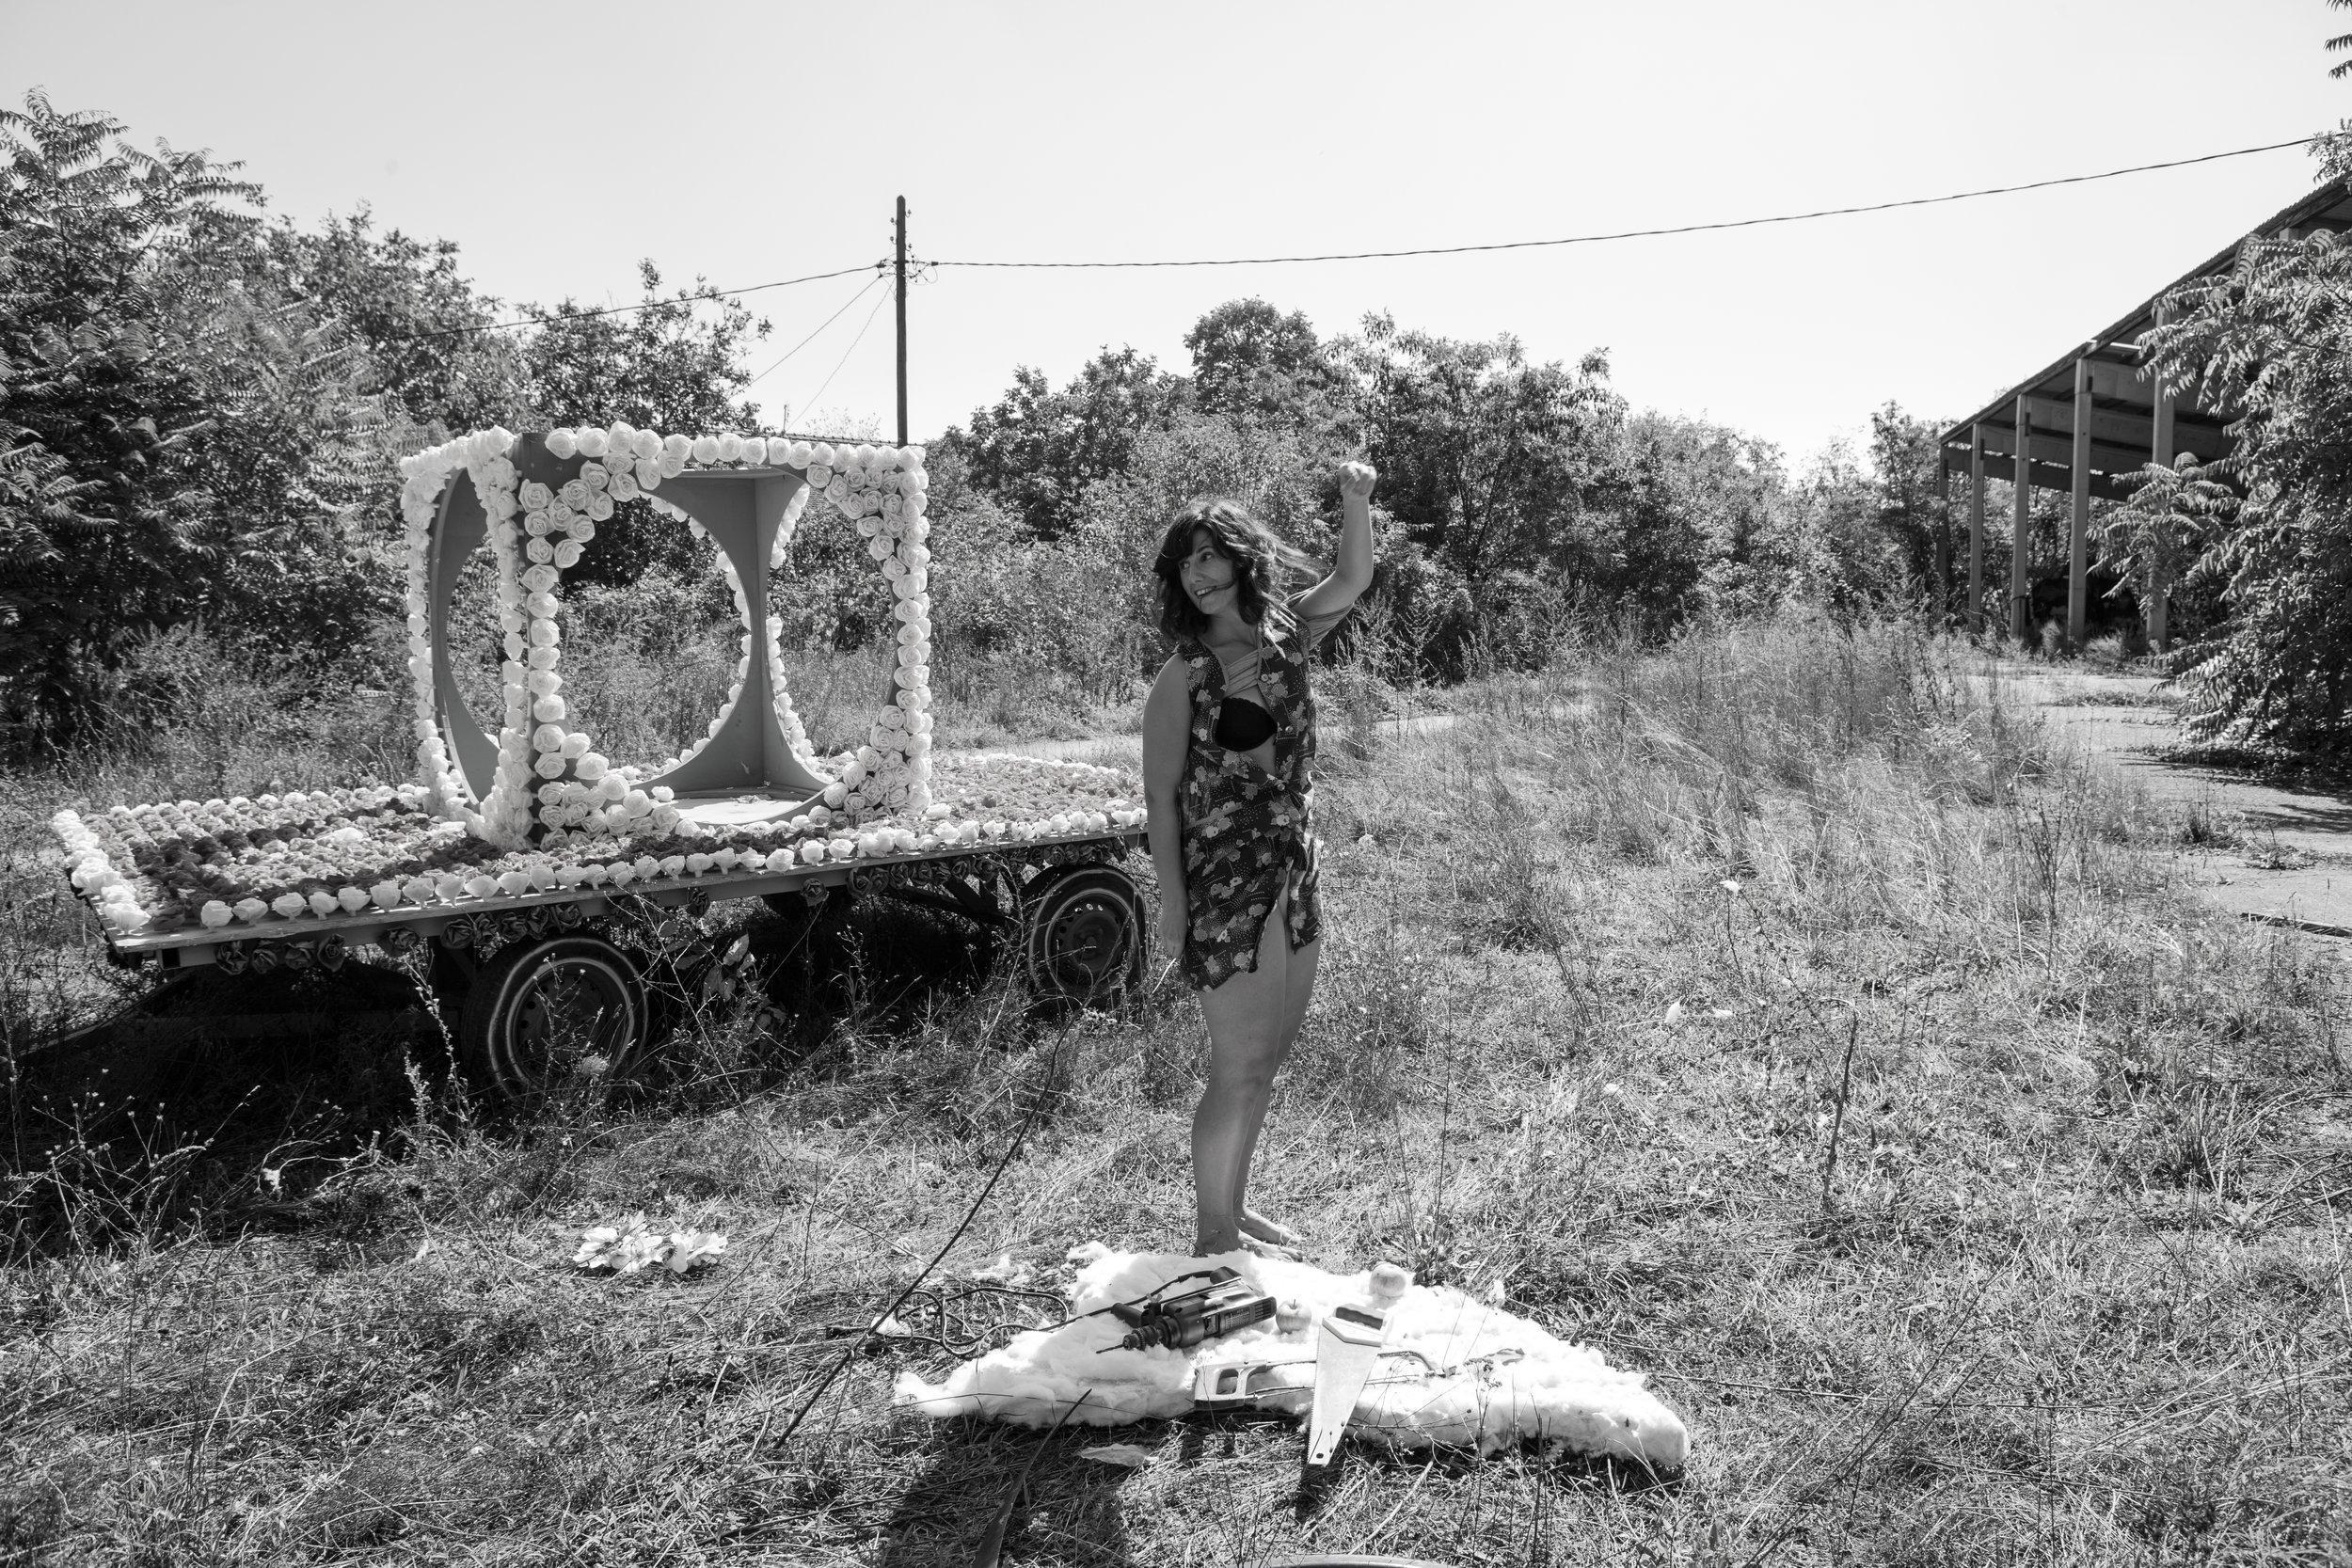 Dragana Brankovic while shooting an artistic video at Agora